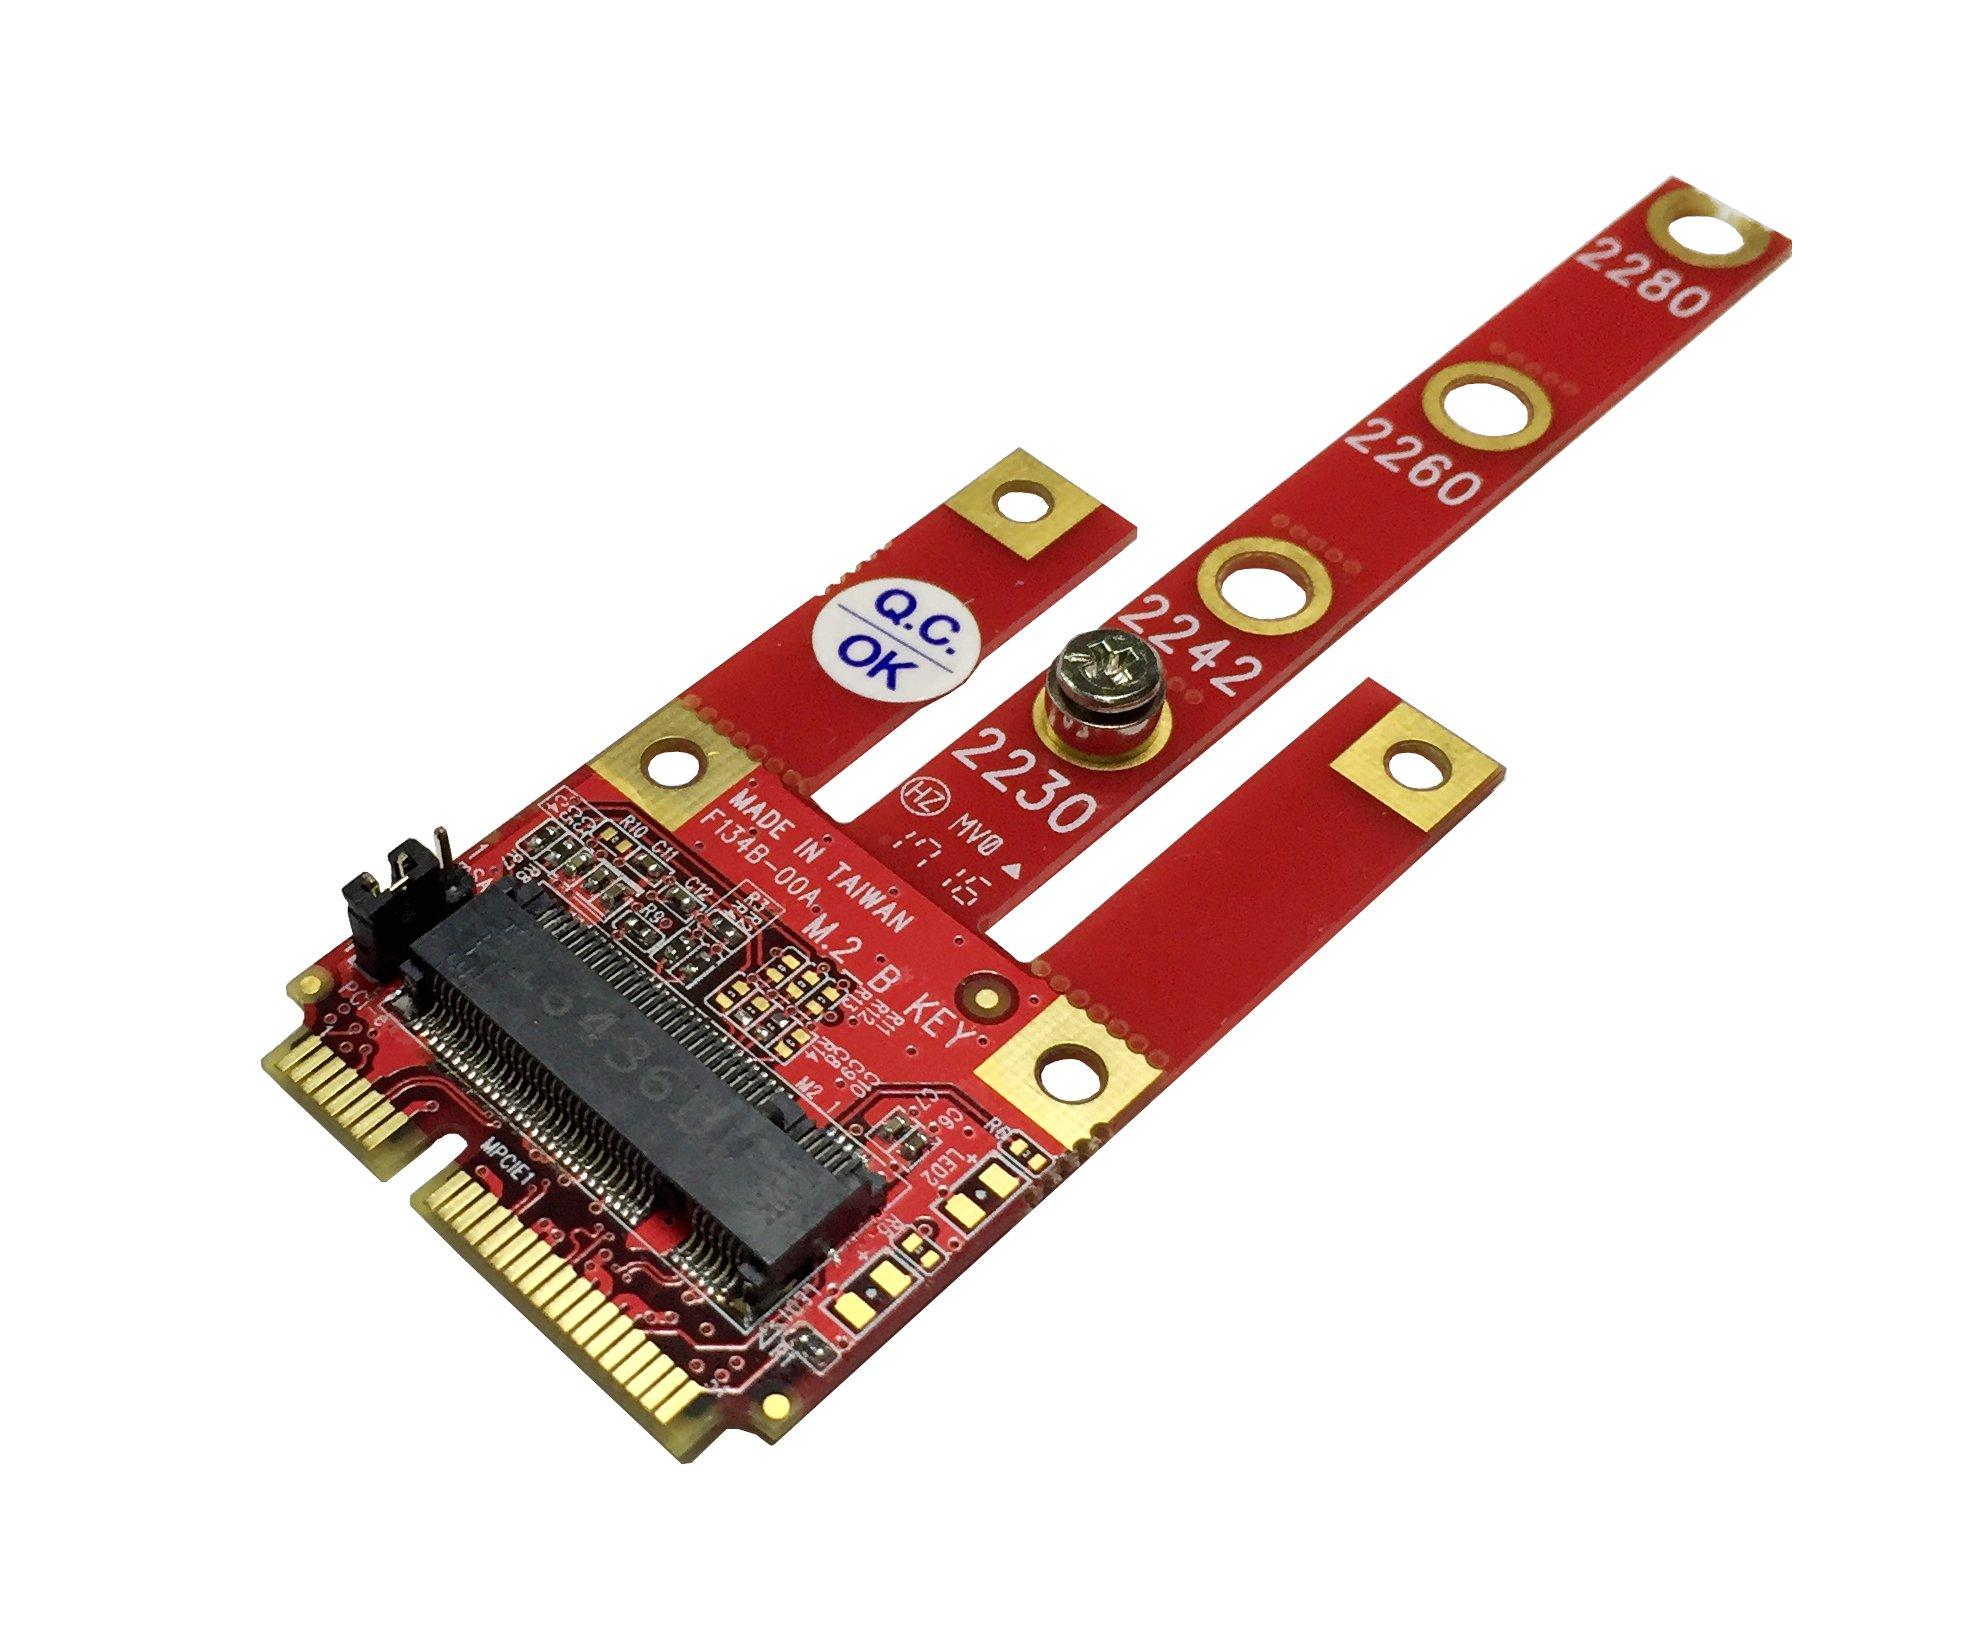 Mini PCIe Ableconn MPEX-134B Adapter with M.2 Key B Slot - S